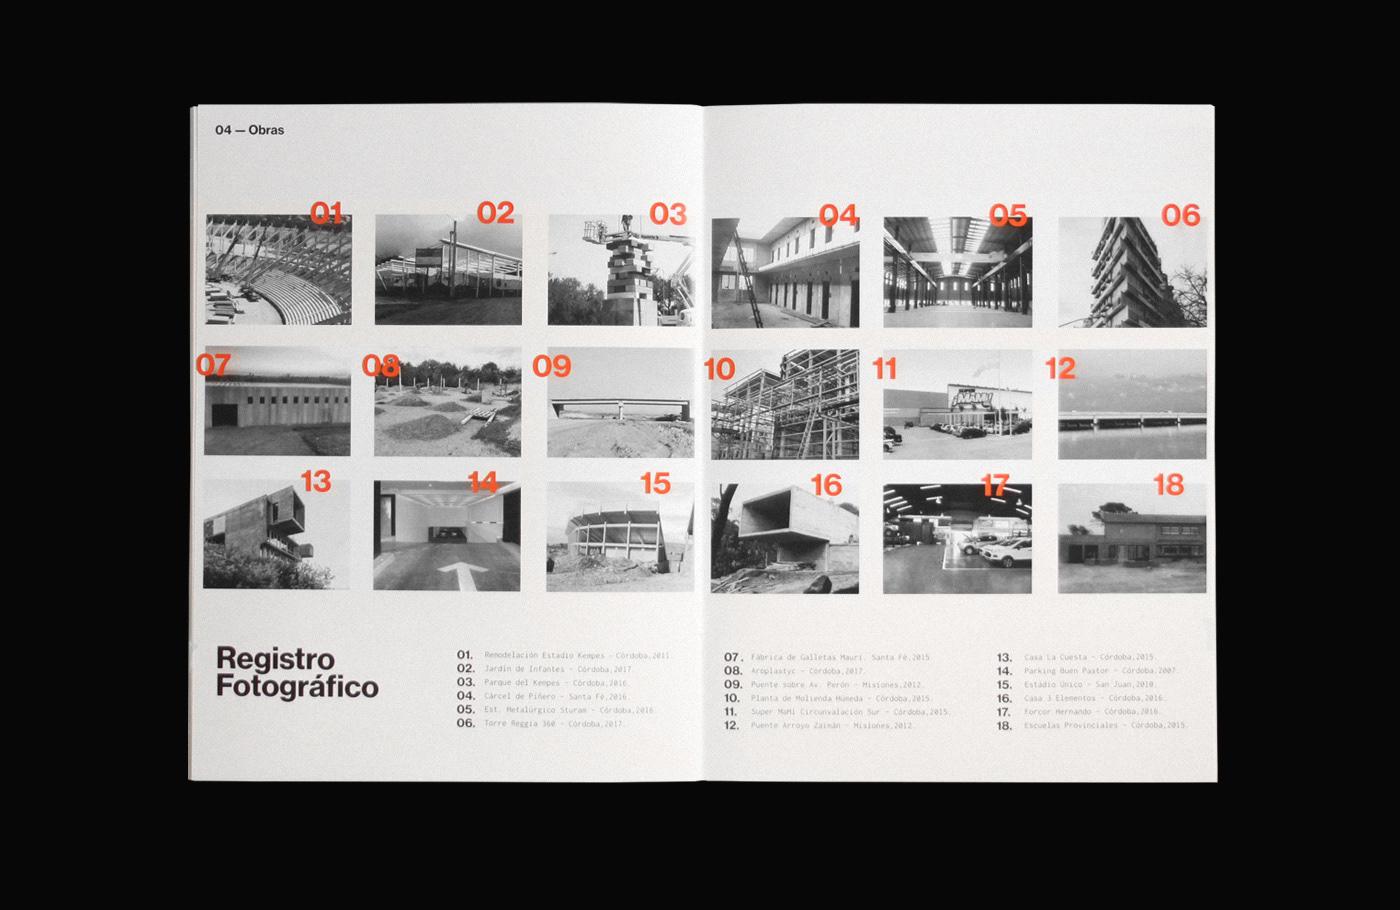 orange construction brochure editorial building architecture car Truck construccion Obras